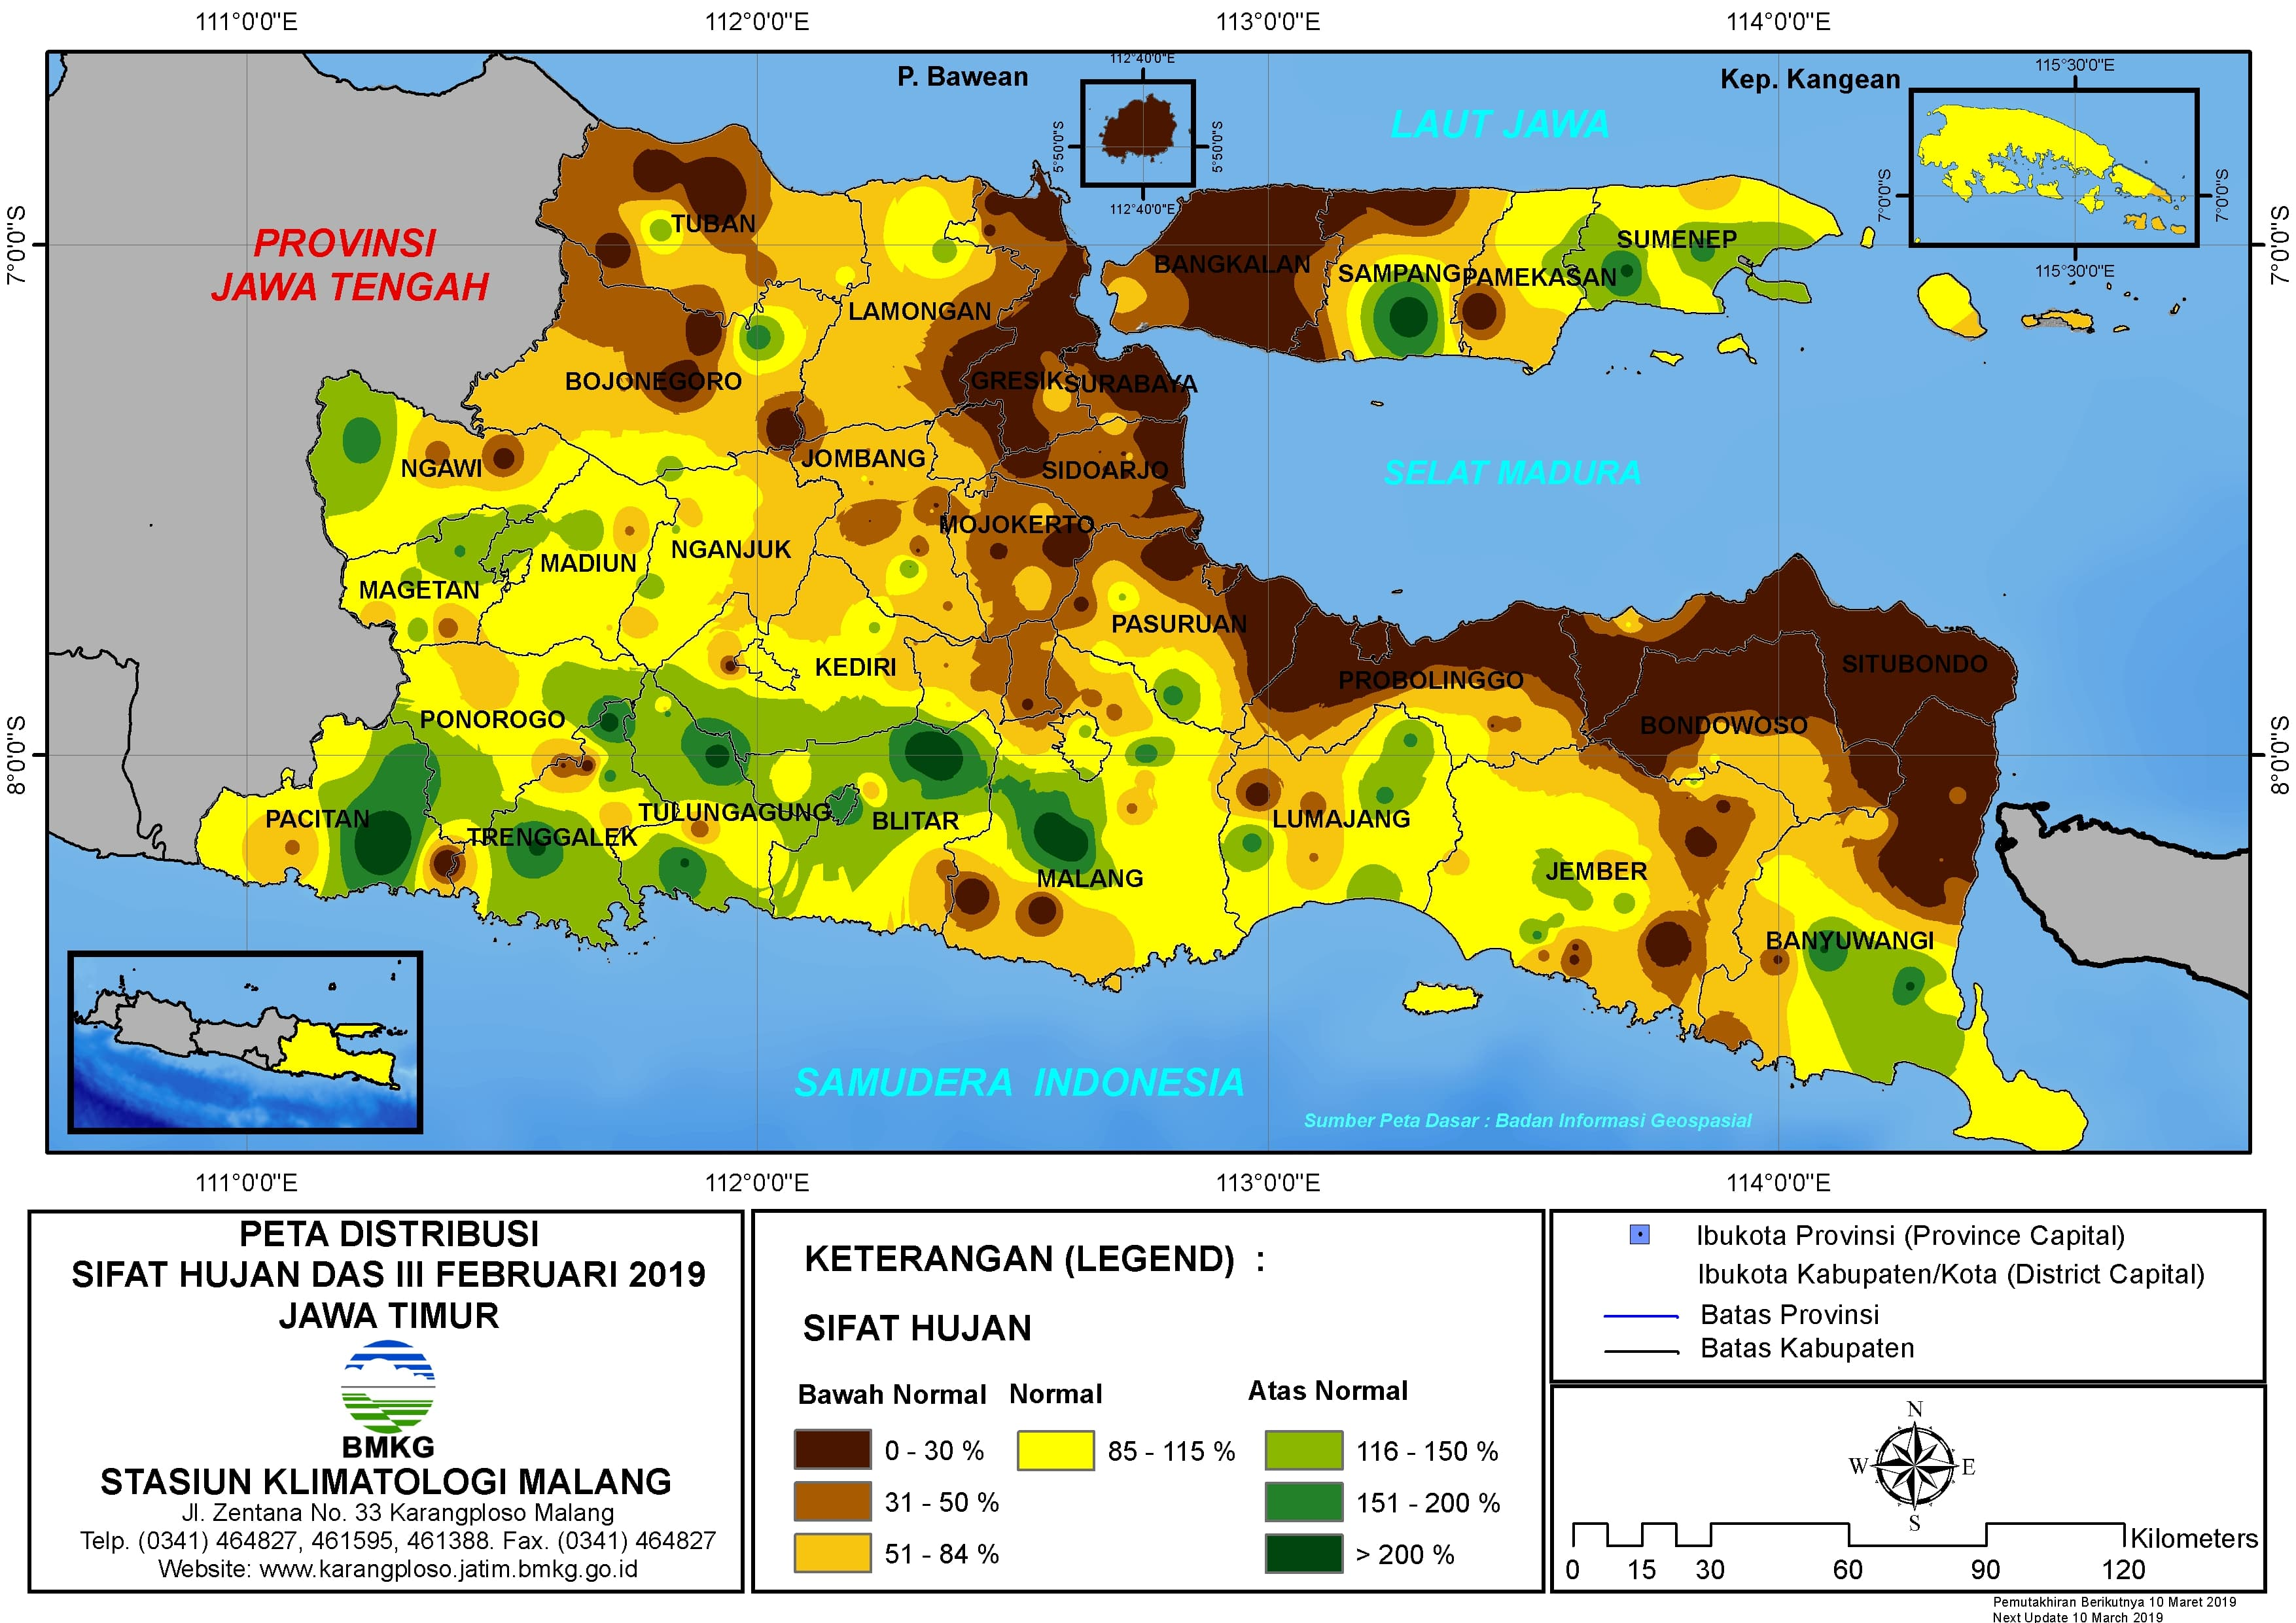 Peta Analisis Distribusi Sifat Hujan Dasarian III Februari 2019 di Provinsi Jawa Timur